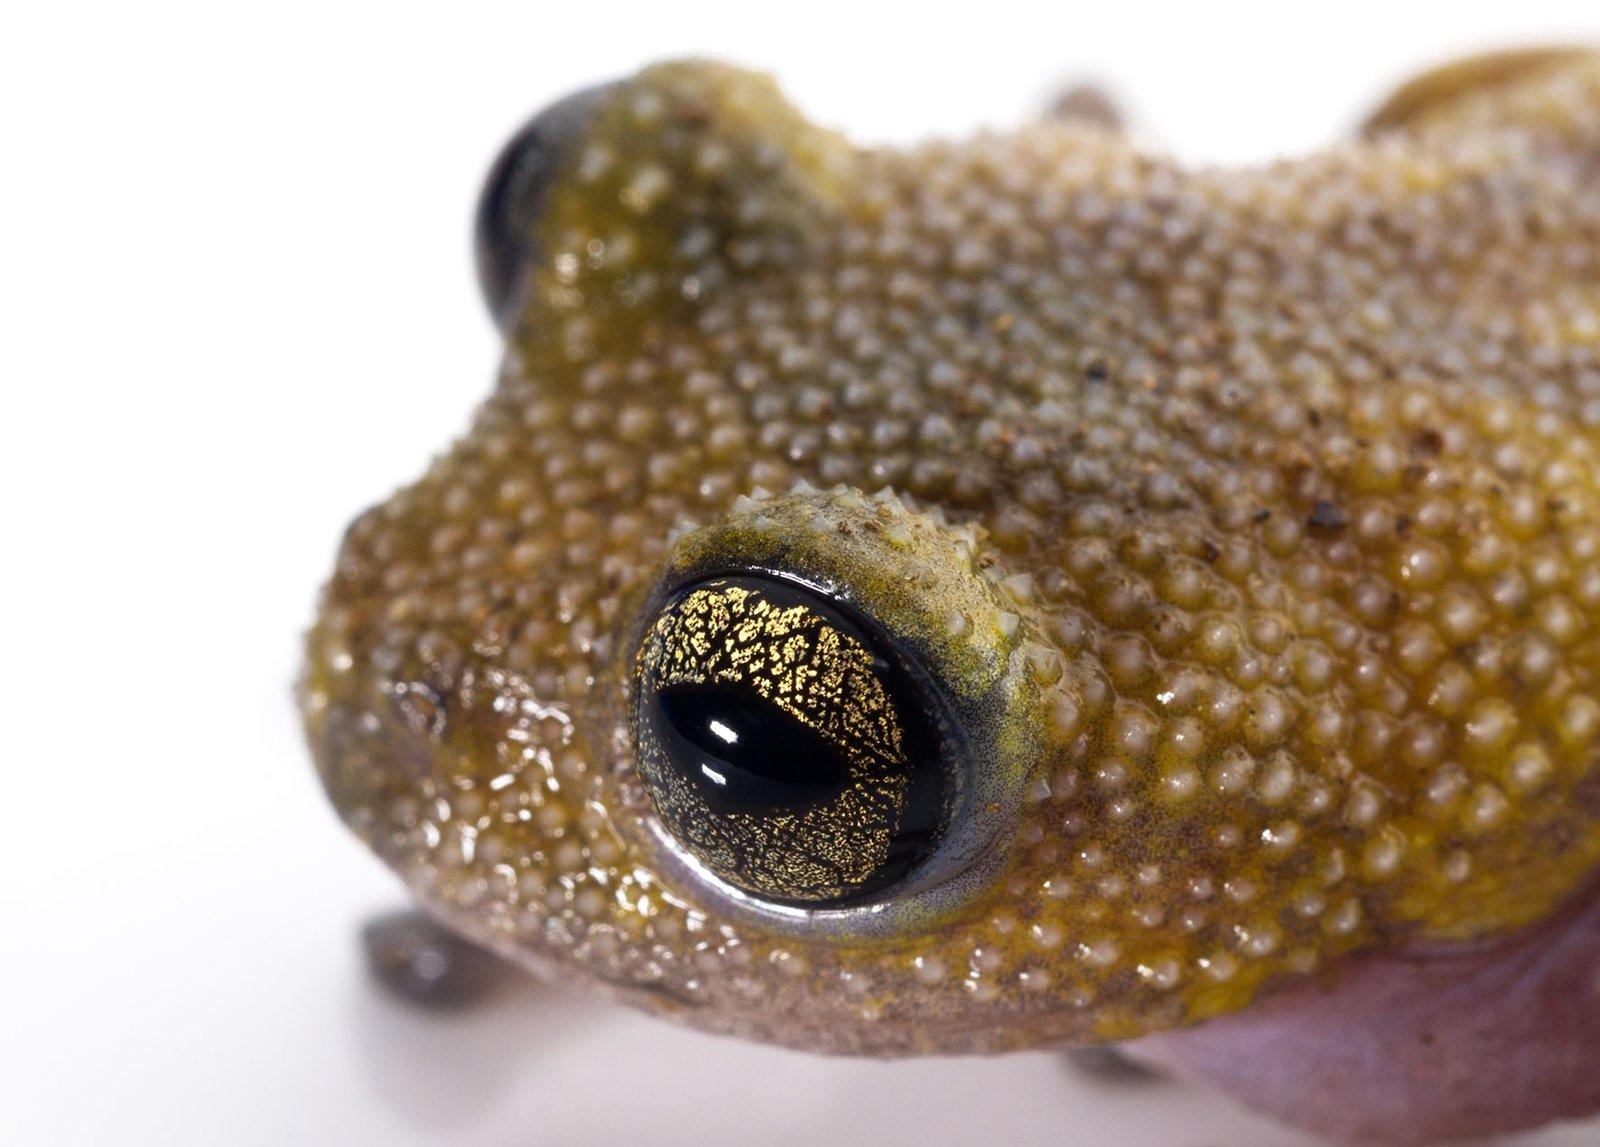 Thorny Tree Frog